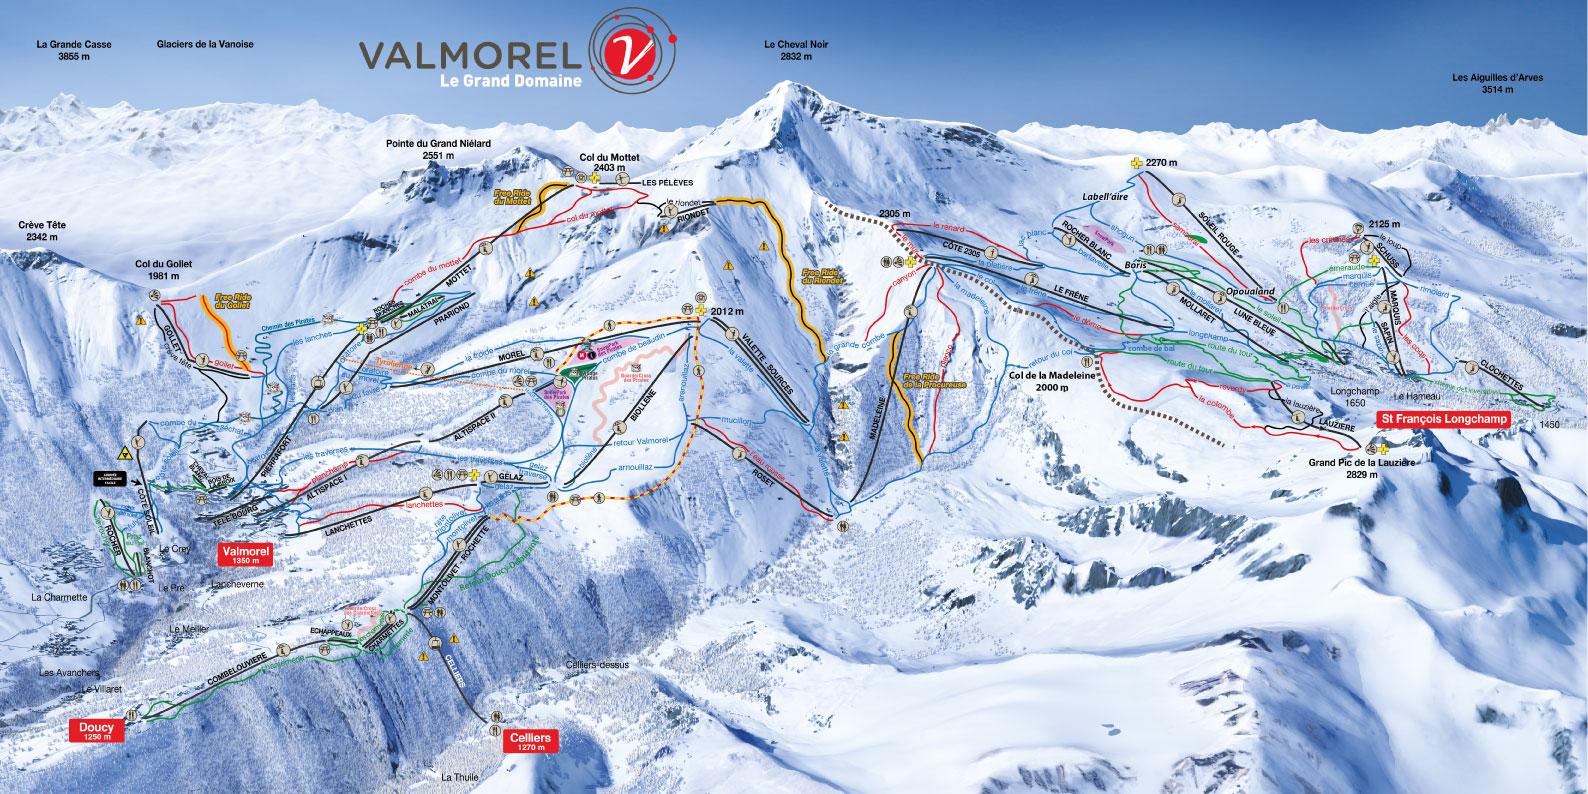 Valmorel Piste / Trail Map